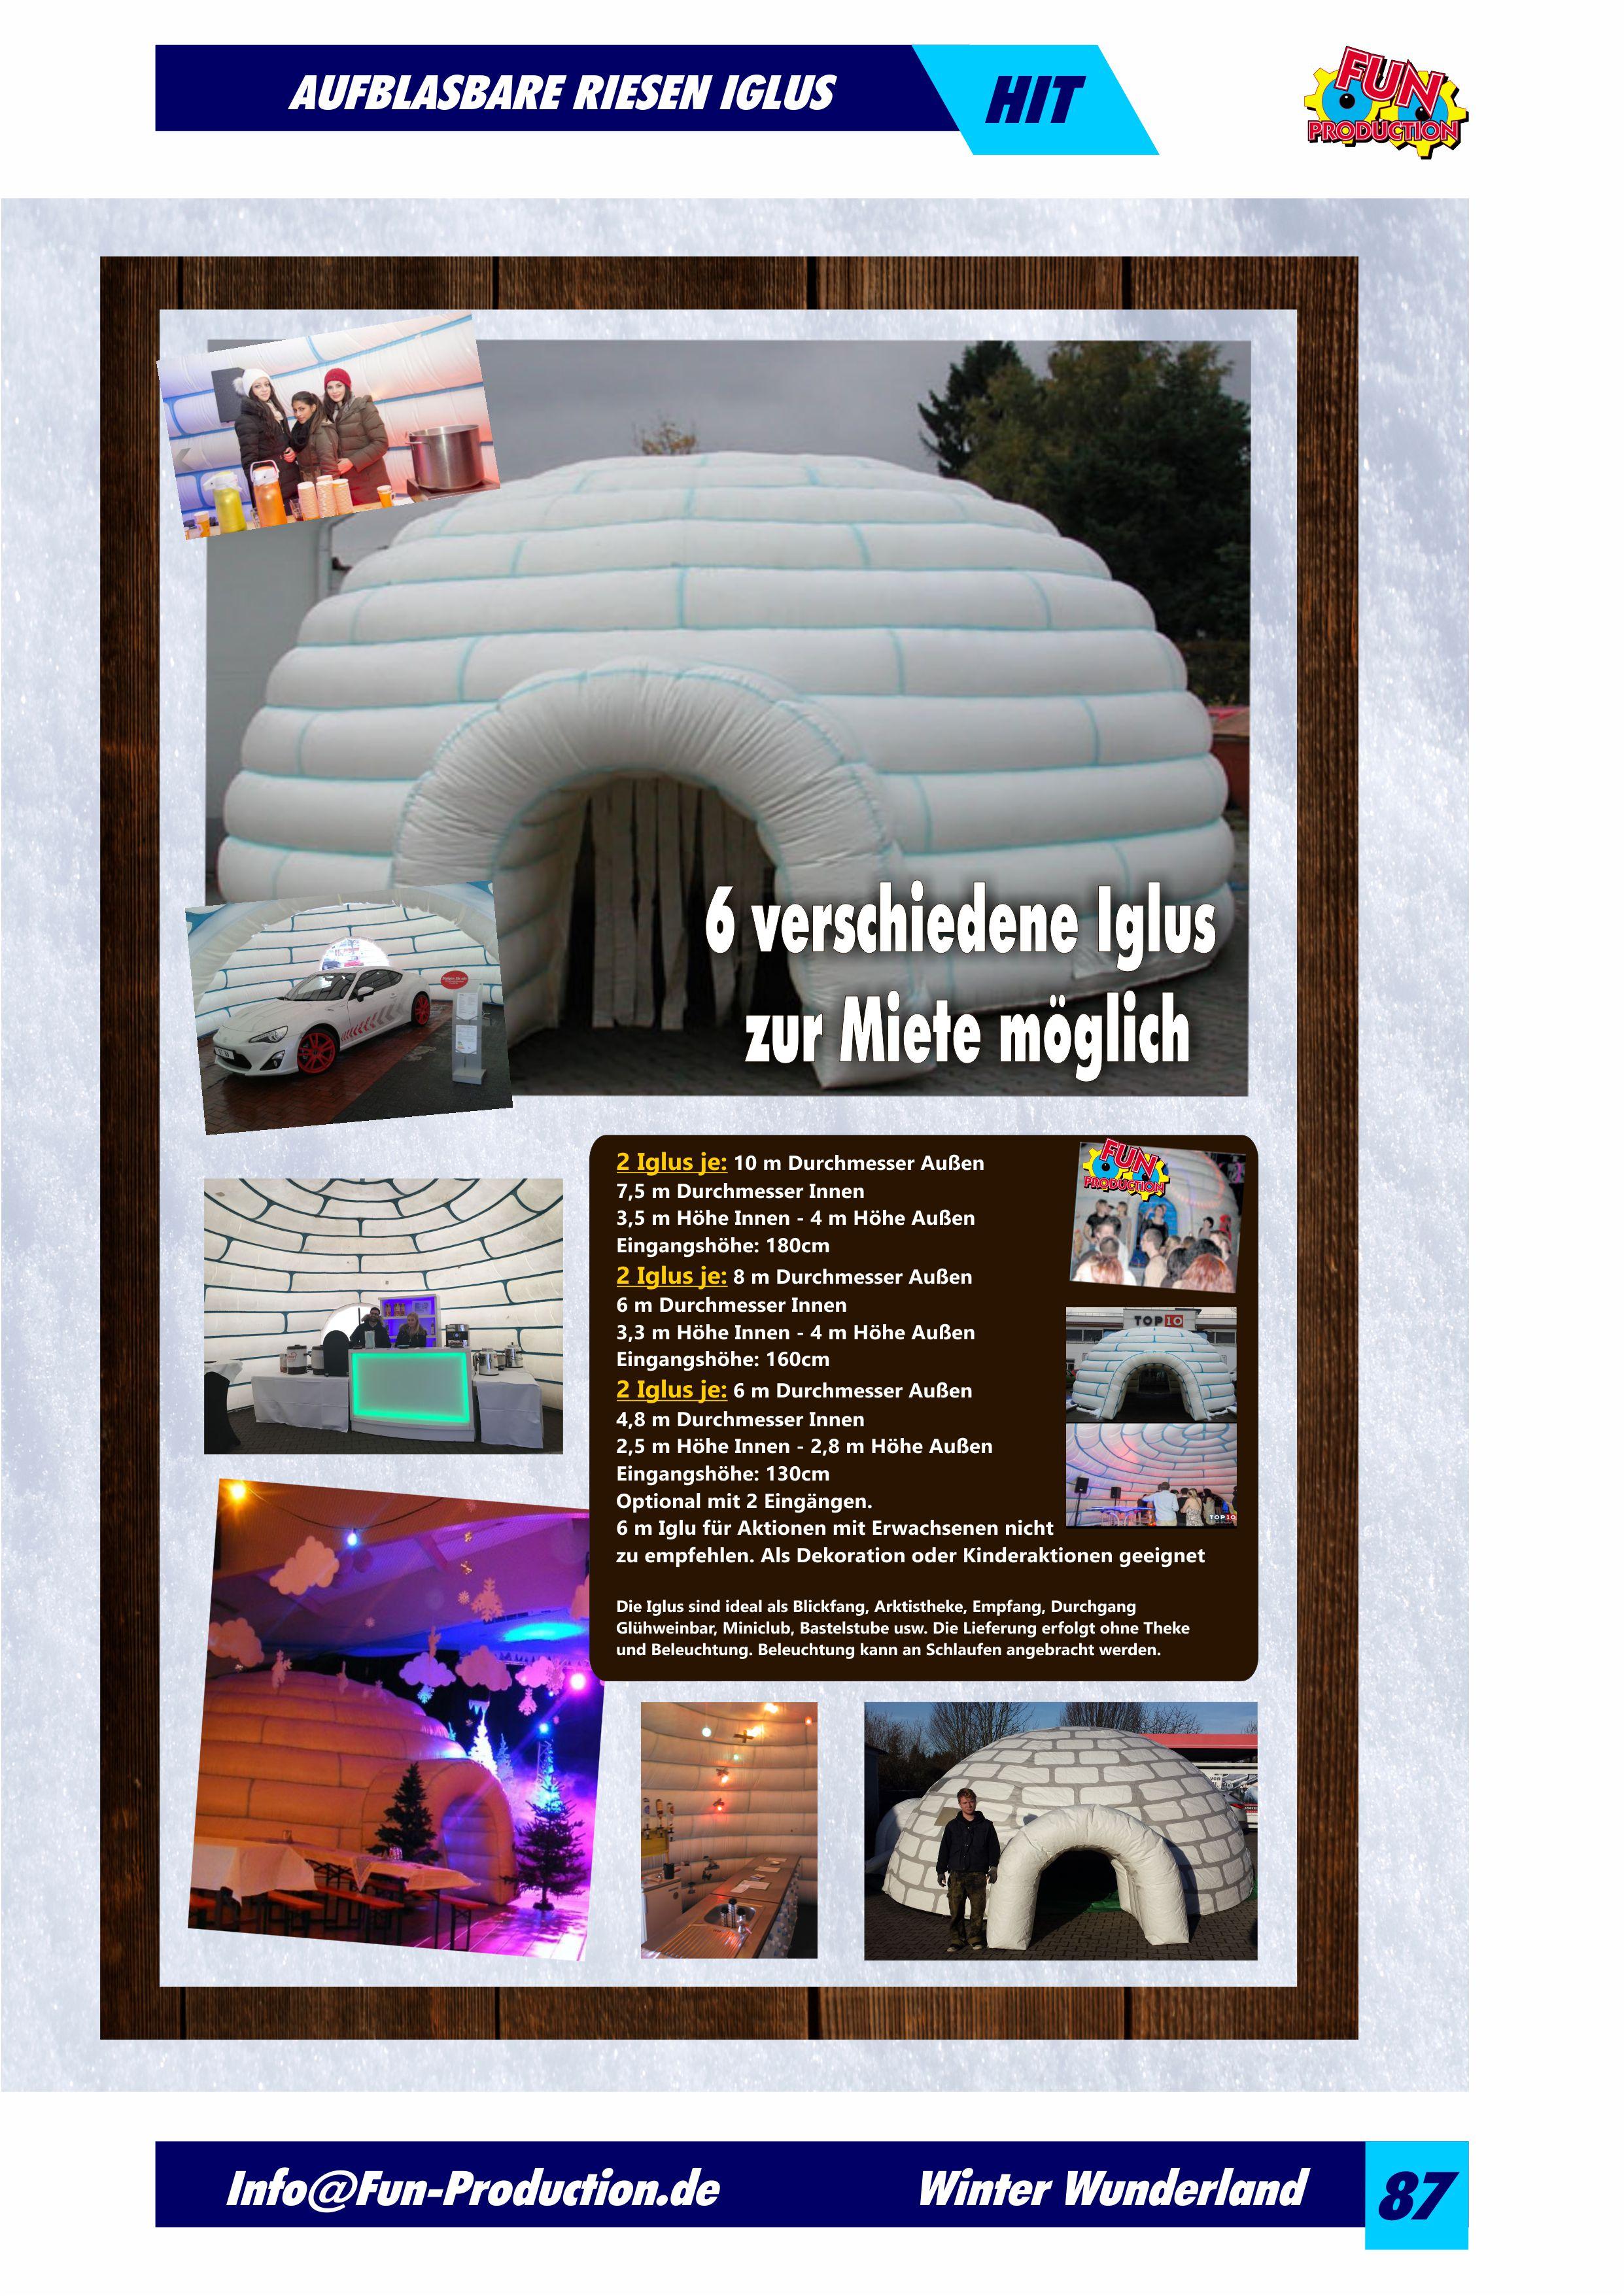 Aufblasbare Riesen Iglus Fun Production GmbH